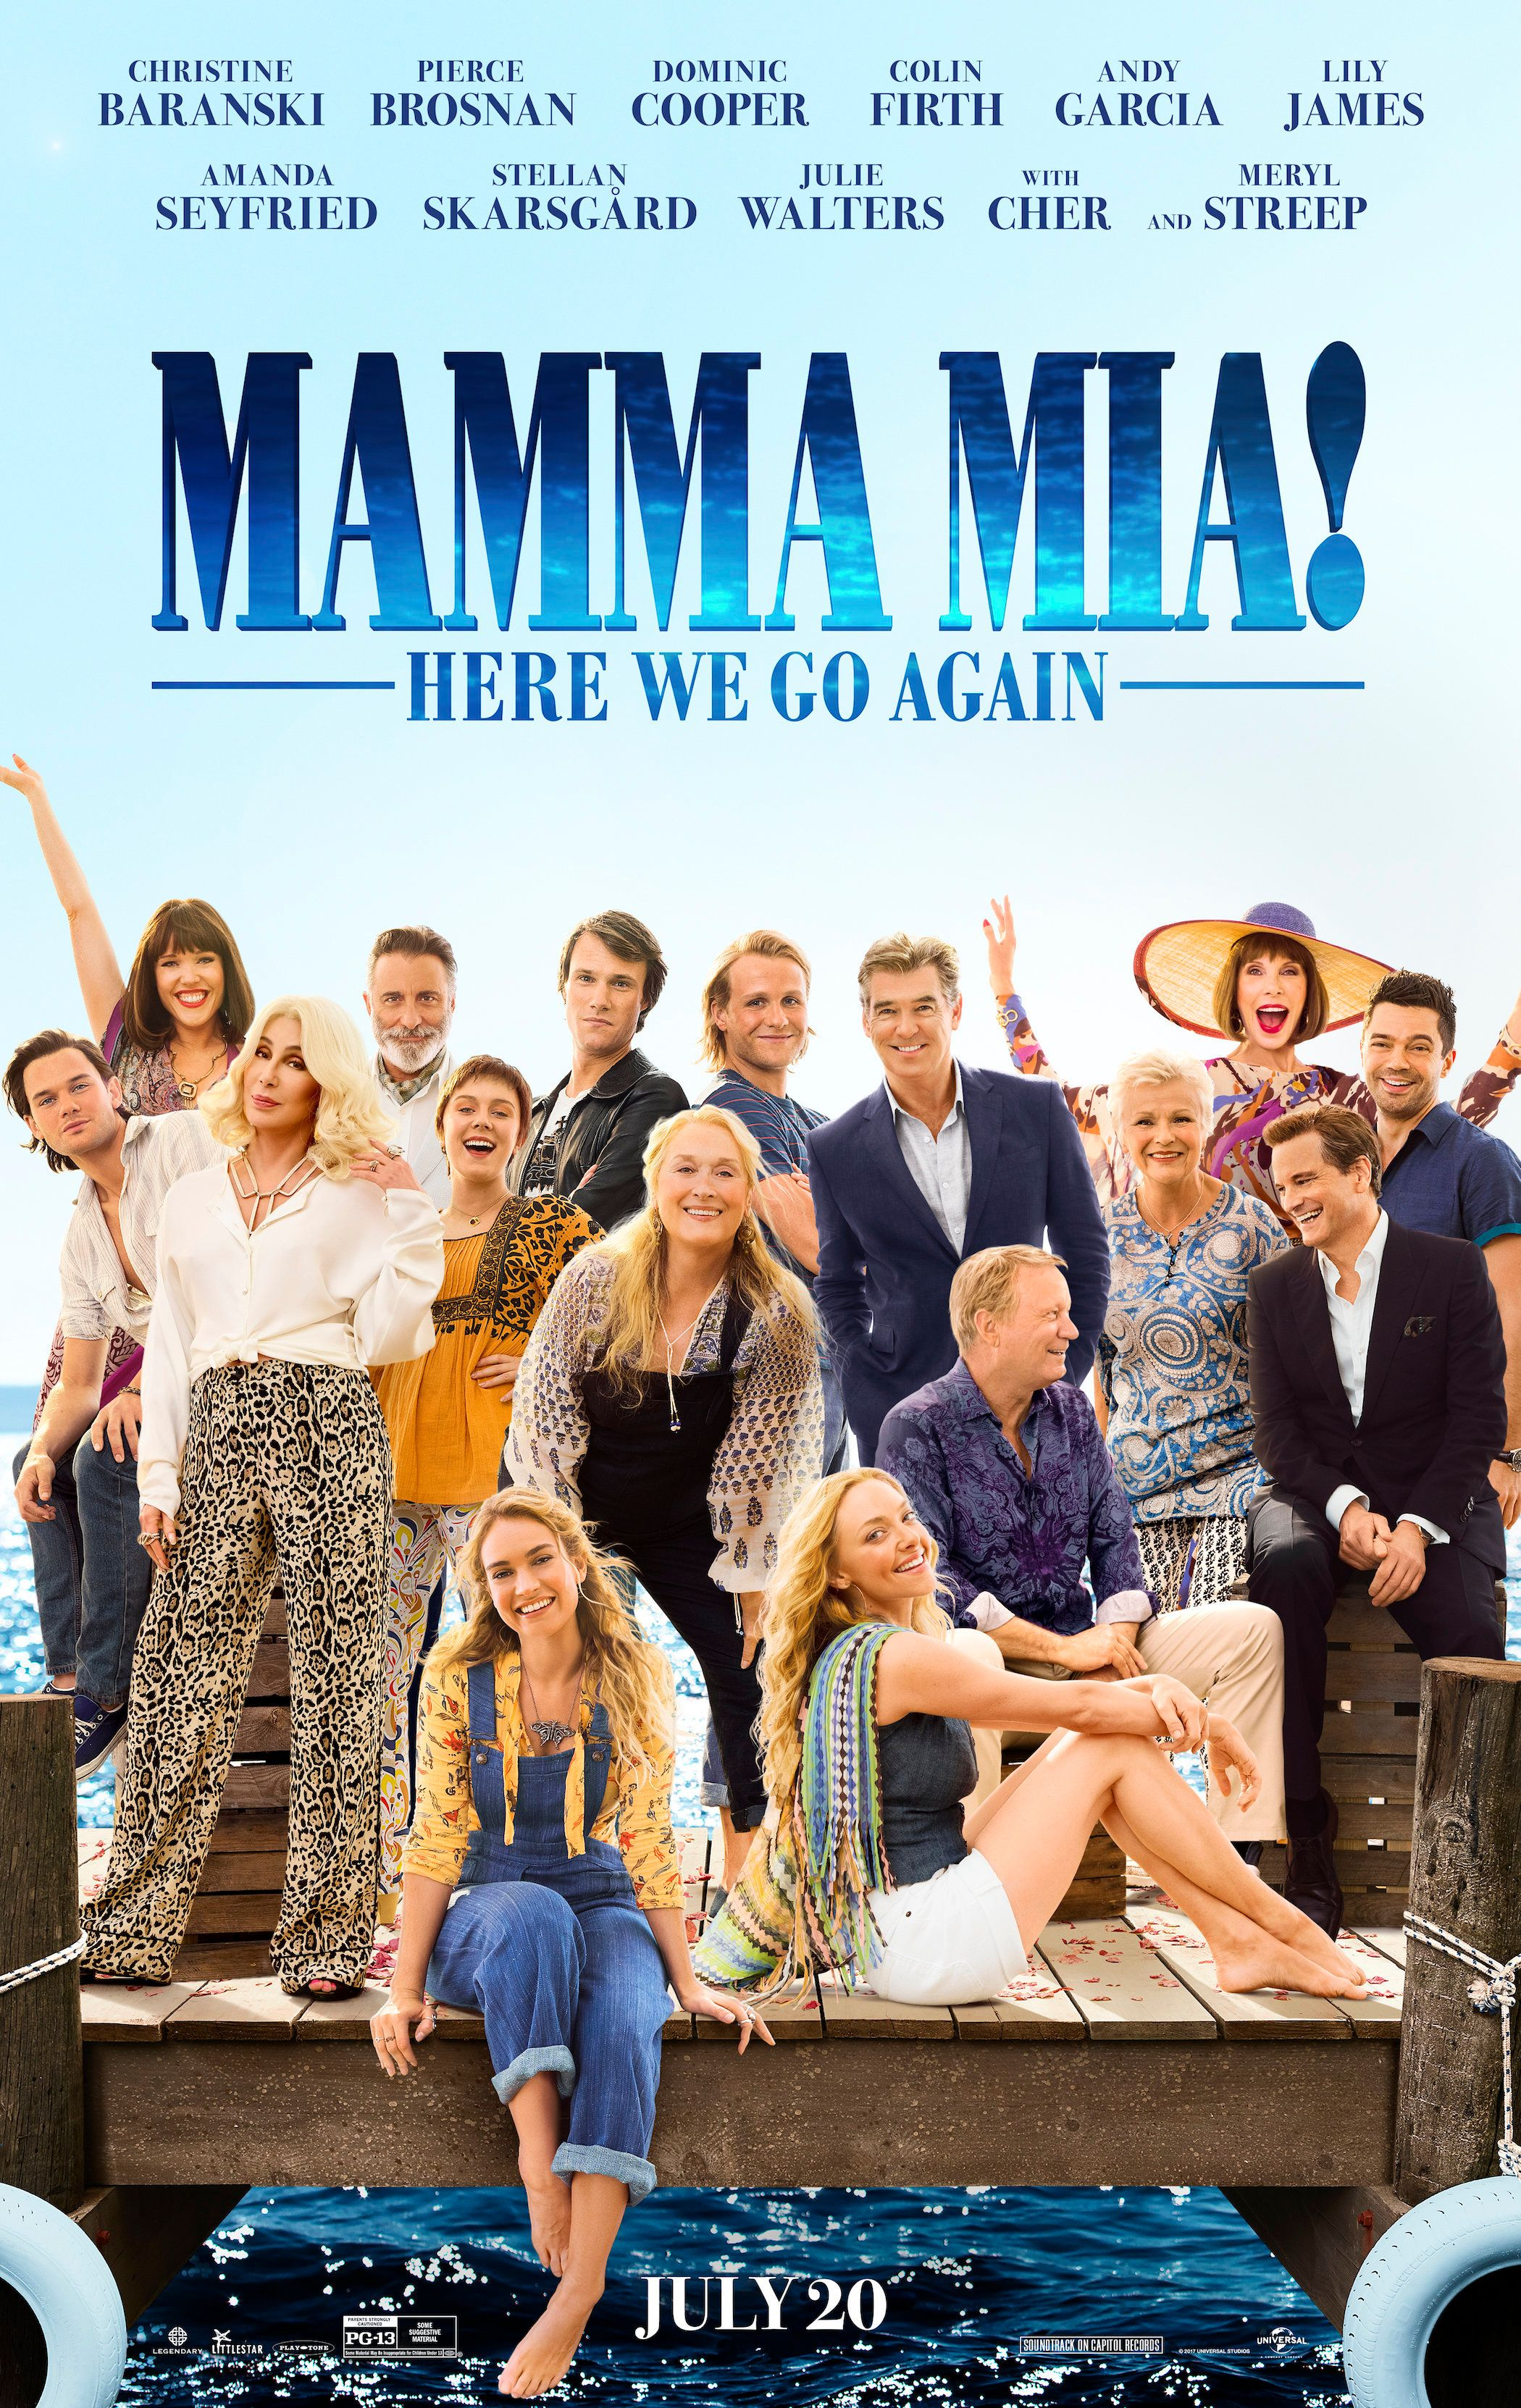 The 15 Minutes That Make 'Mamma Mia: Here We Go Again' Worth